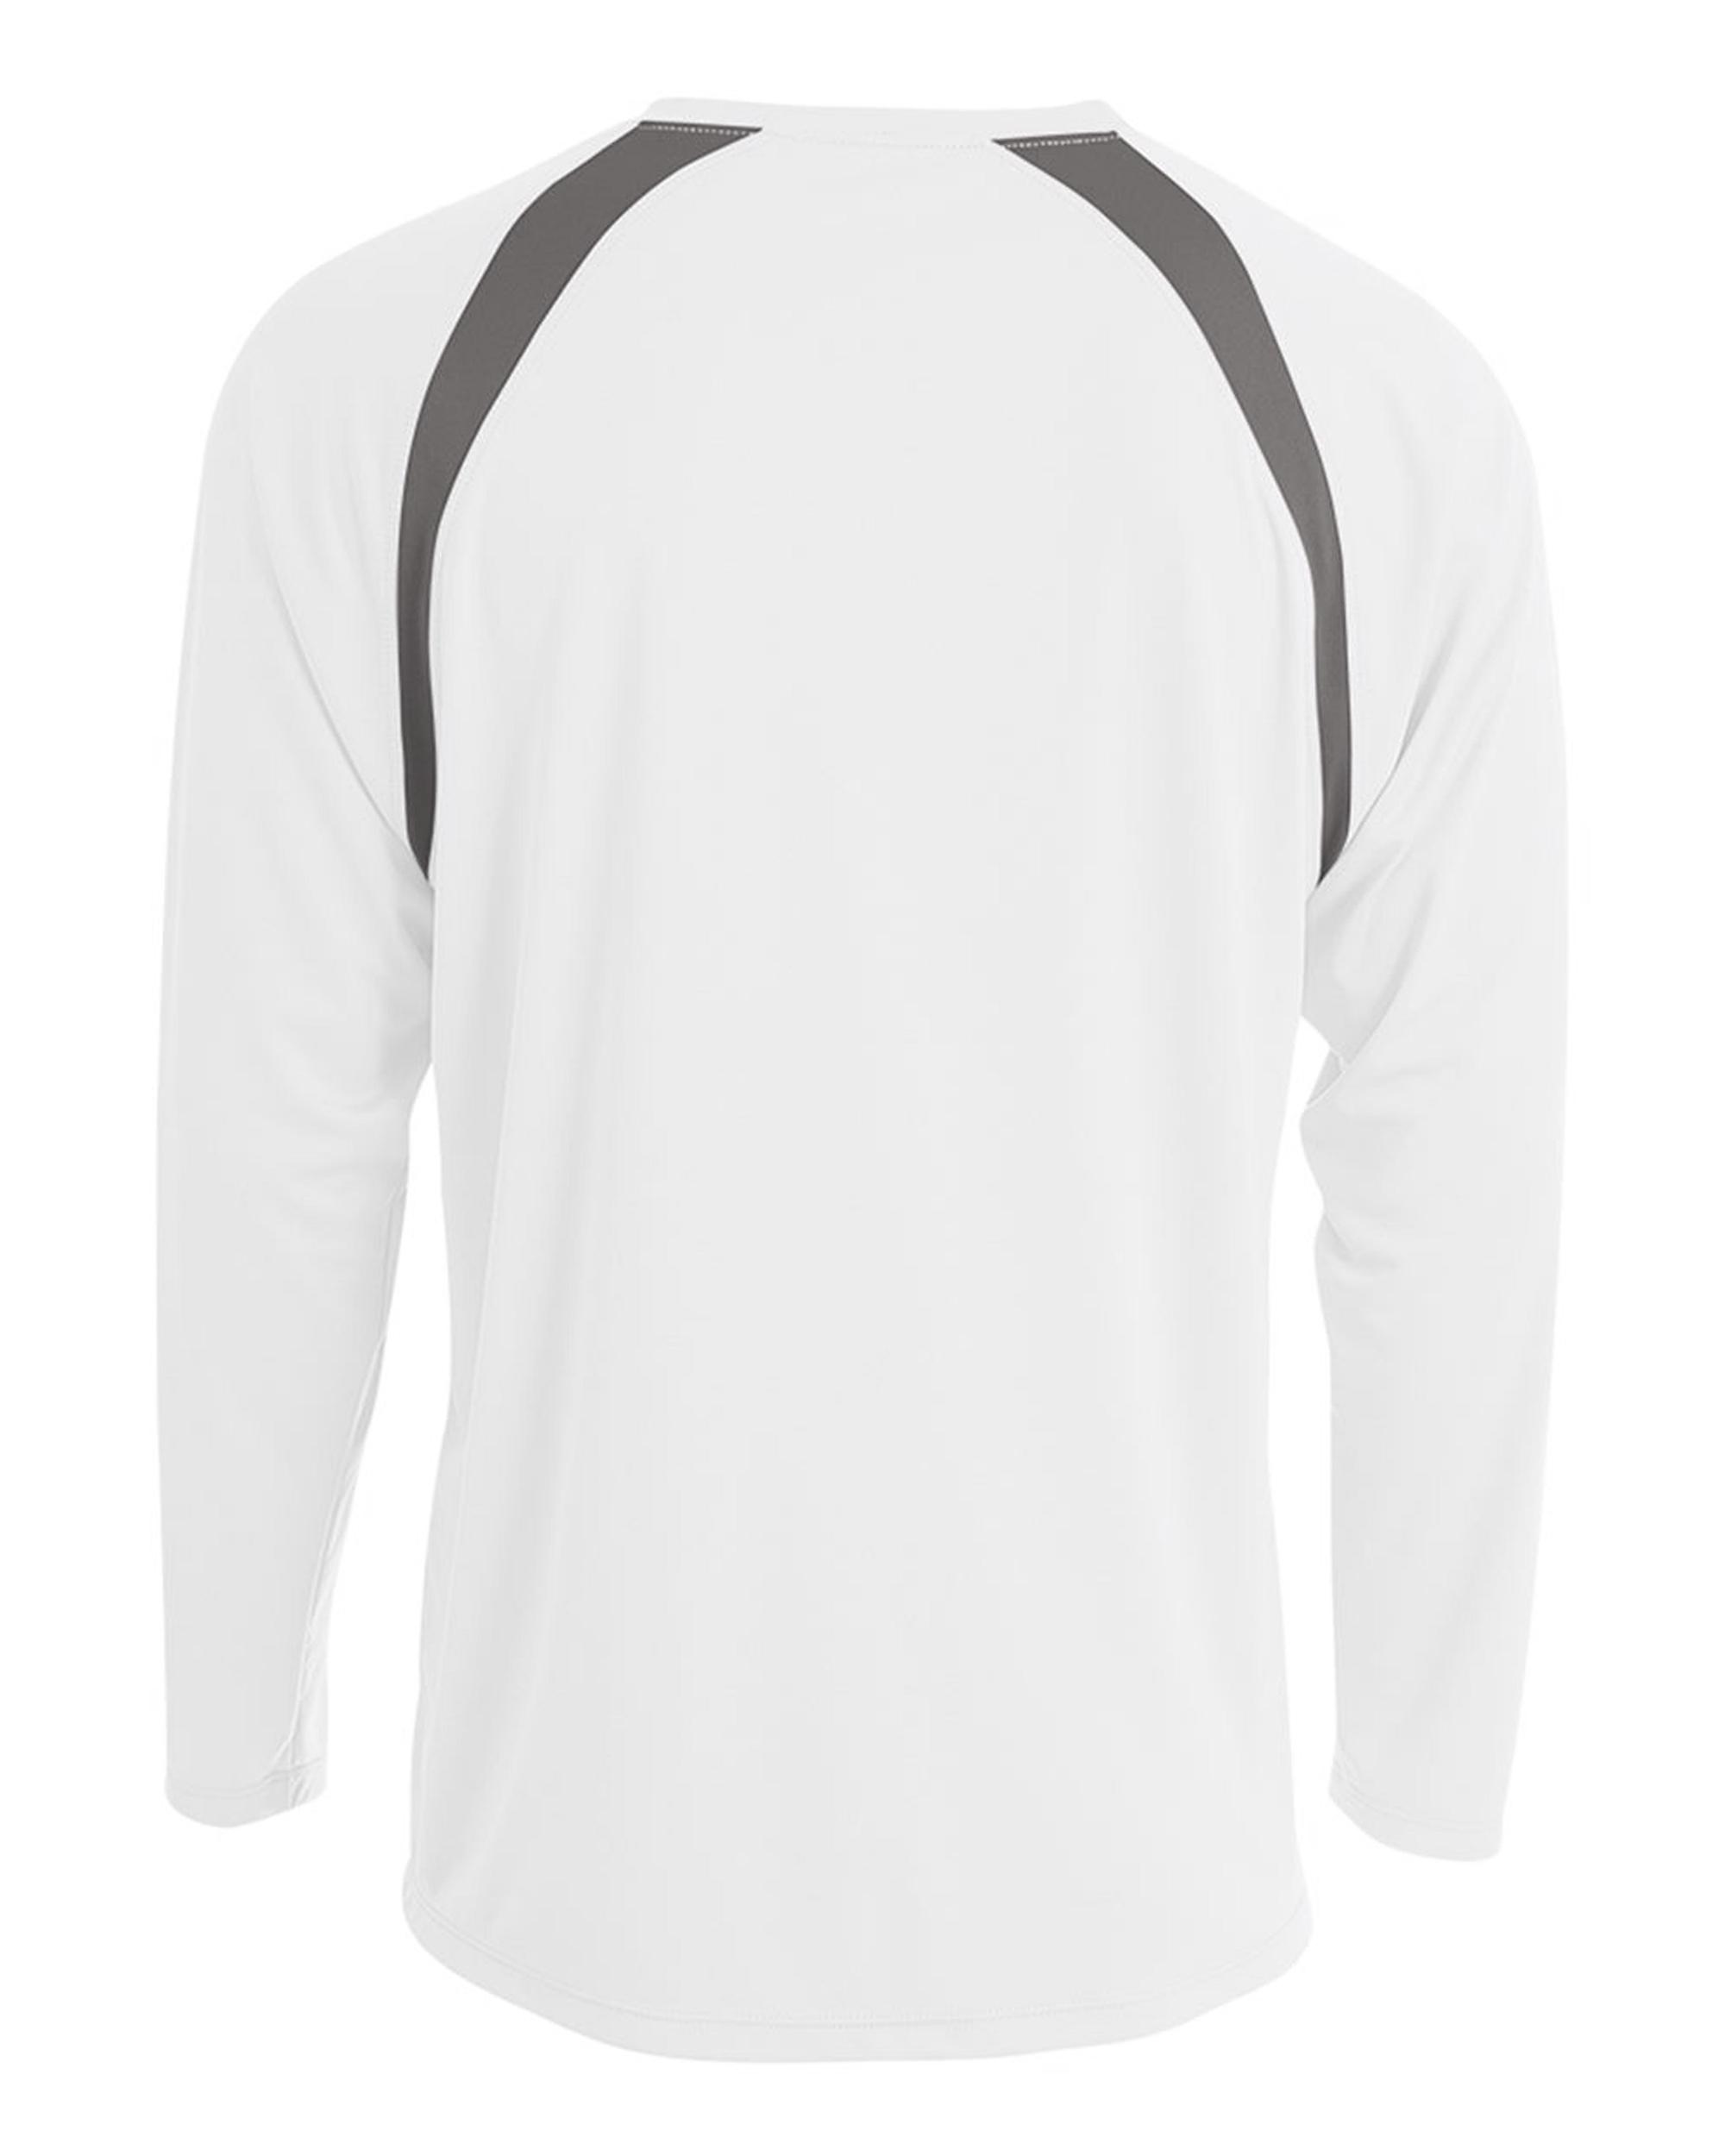 Men-039-s-Long-Sleeve-Loose-Fit-Rash-Guard-Surf-Shirt-Water-Sports-Swimwear thumbnail 28